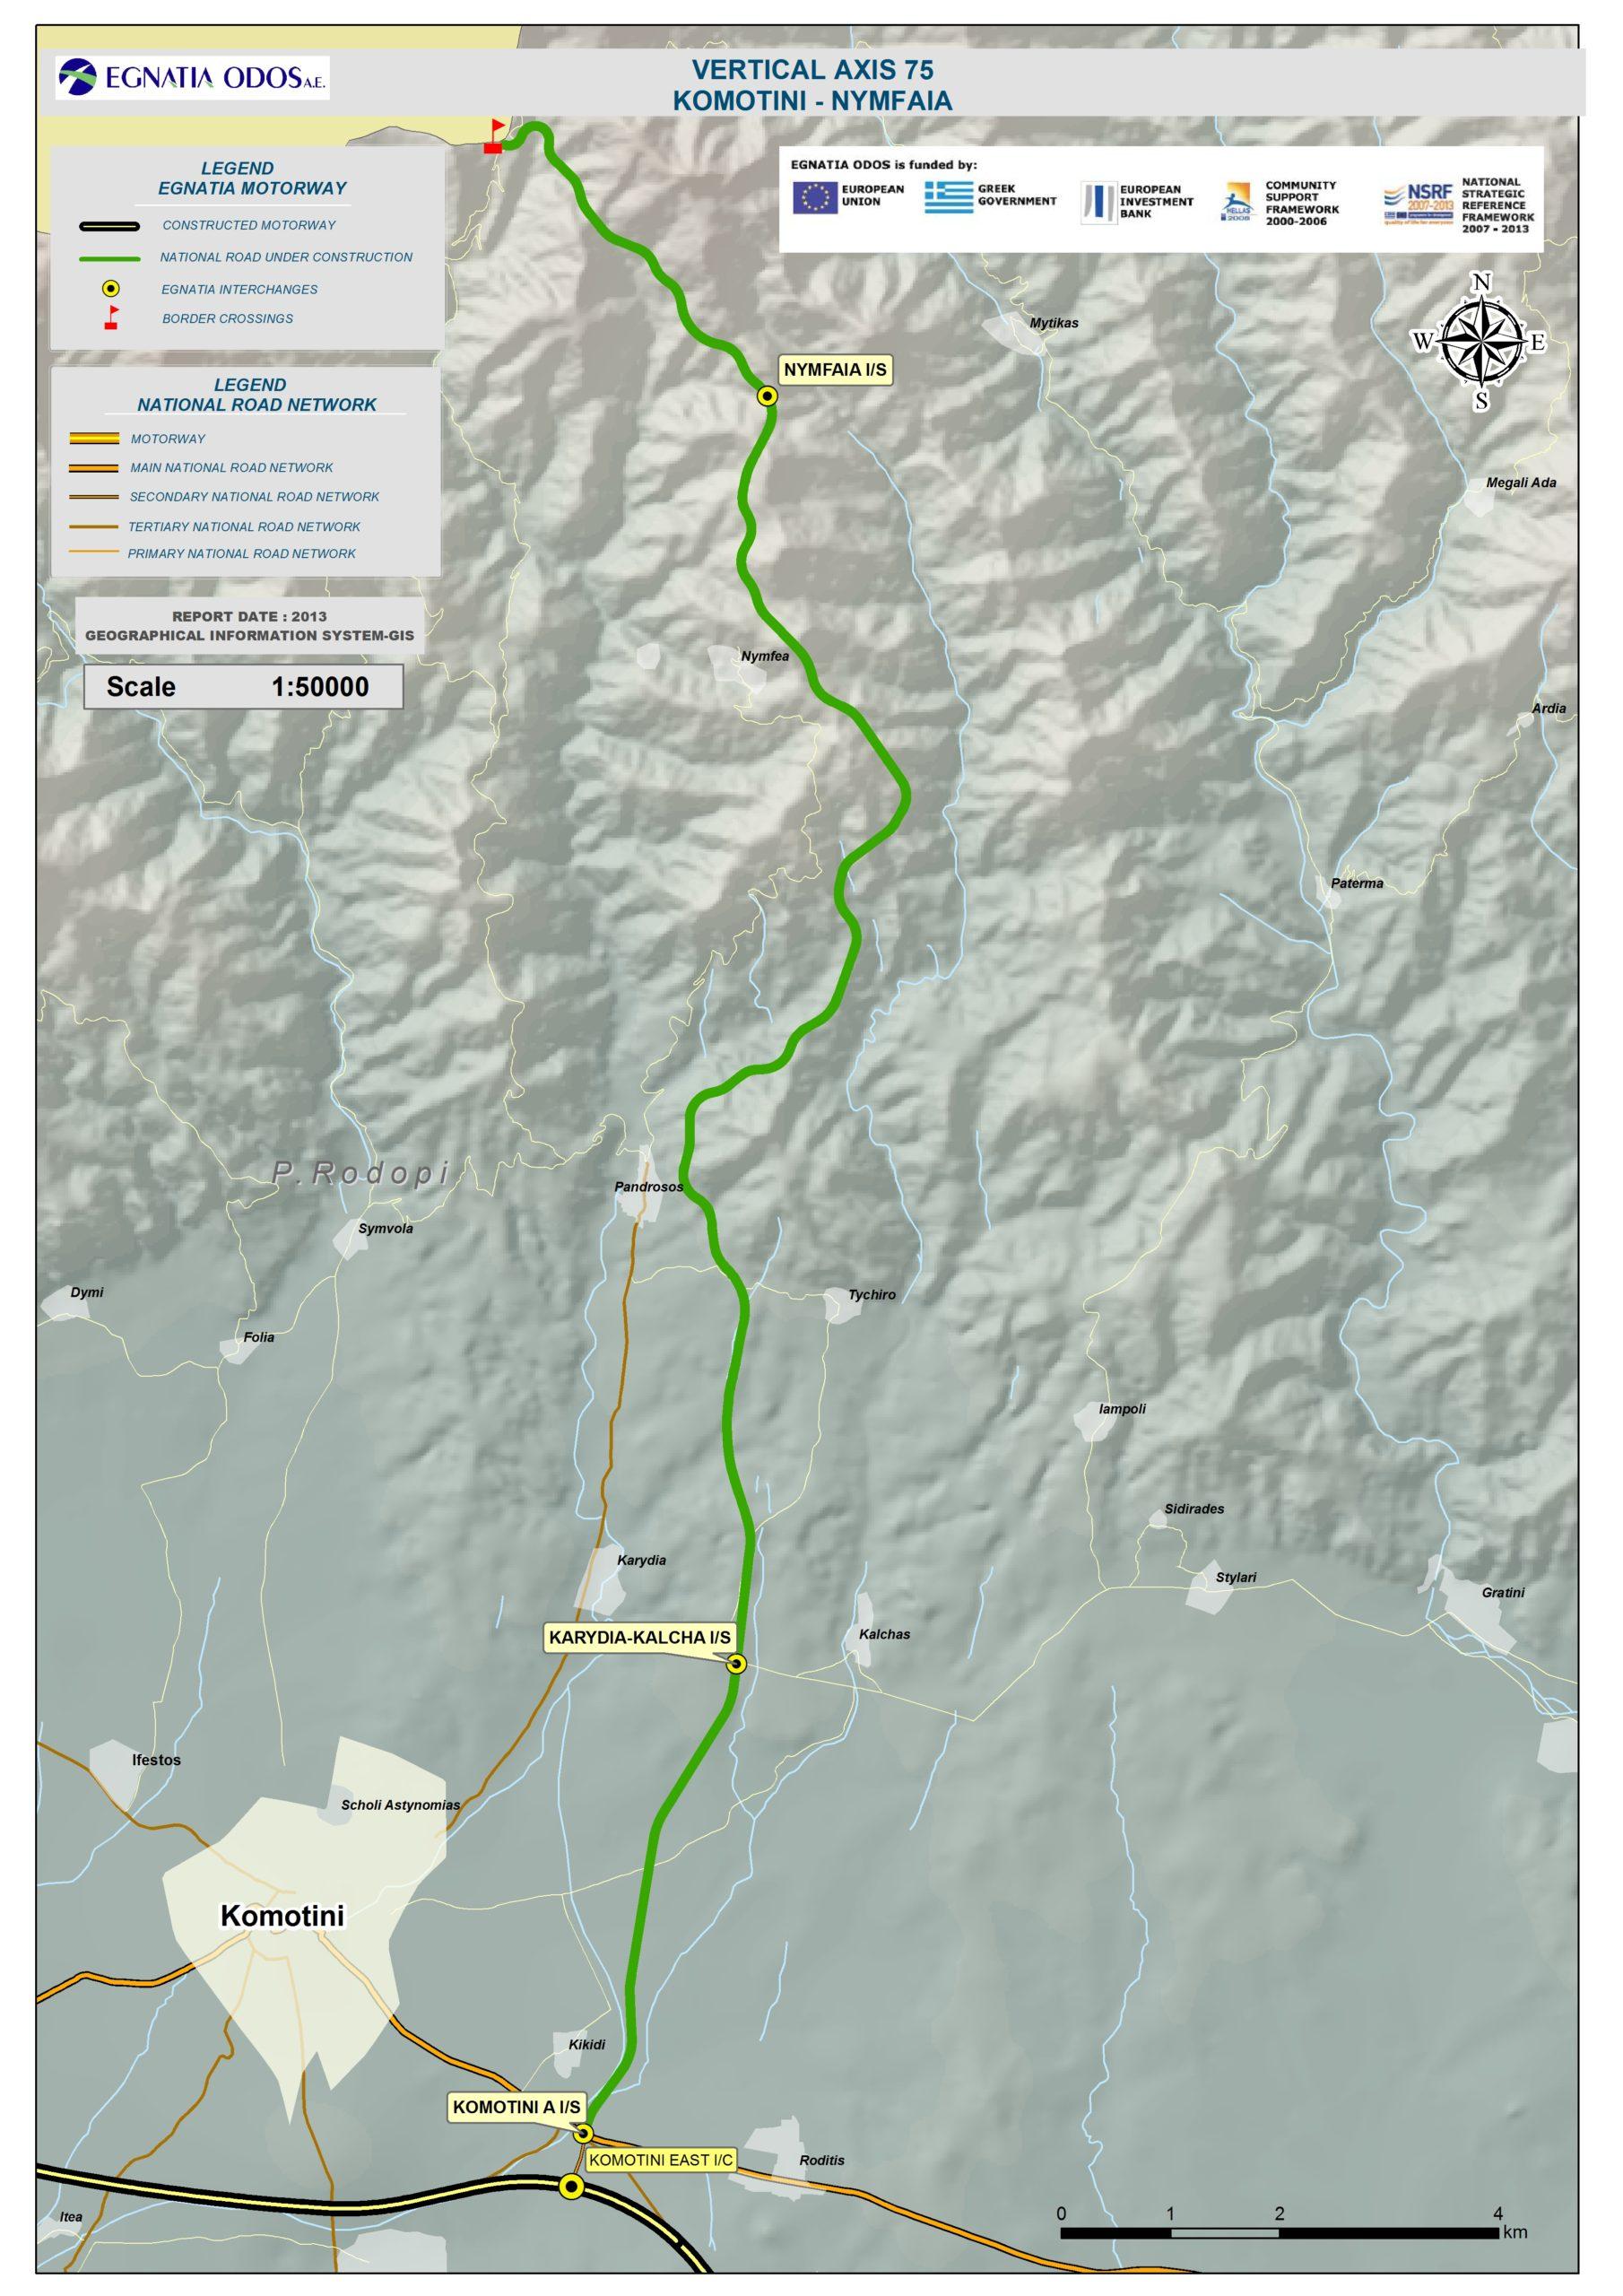 VA Komotini-Nimfea-Greek-Bulgarian Borders